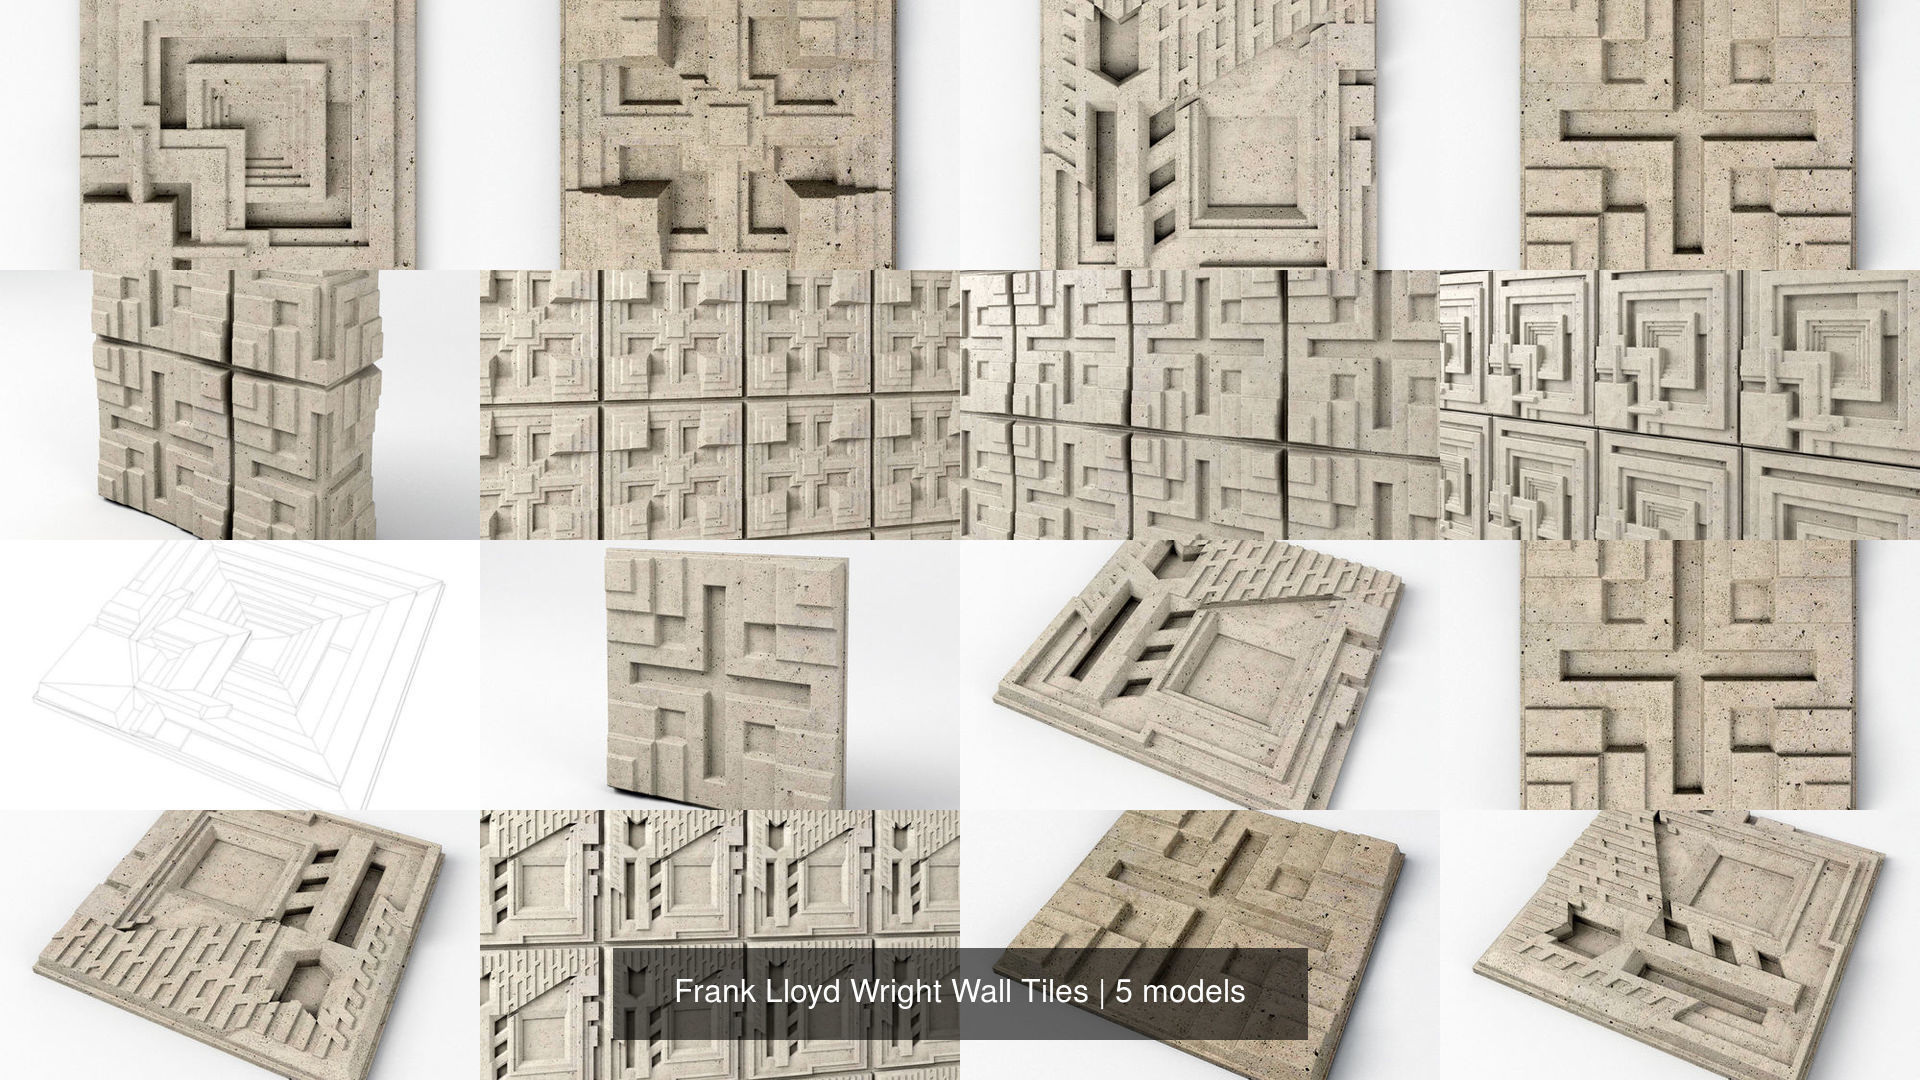 Frank Lloyd Wright Wall Tiles